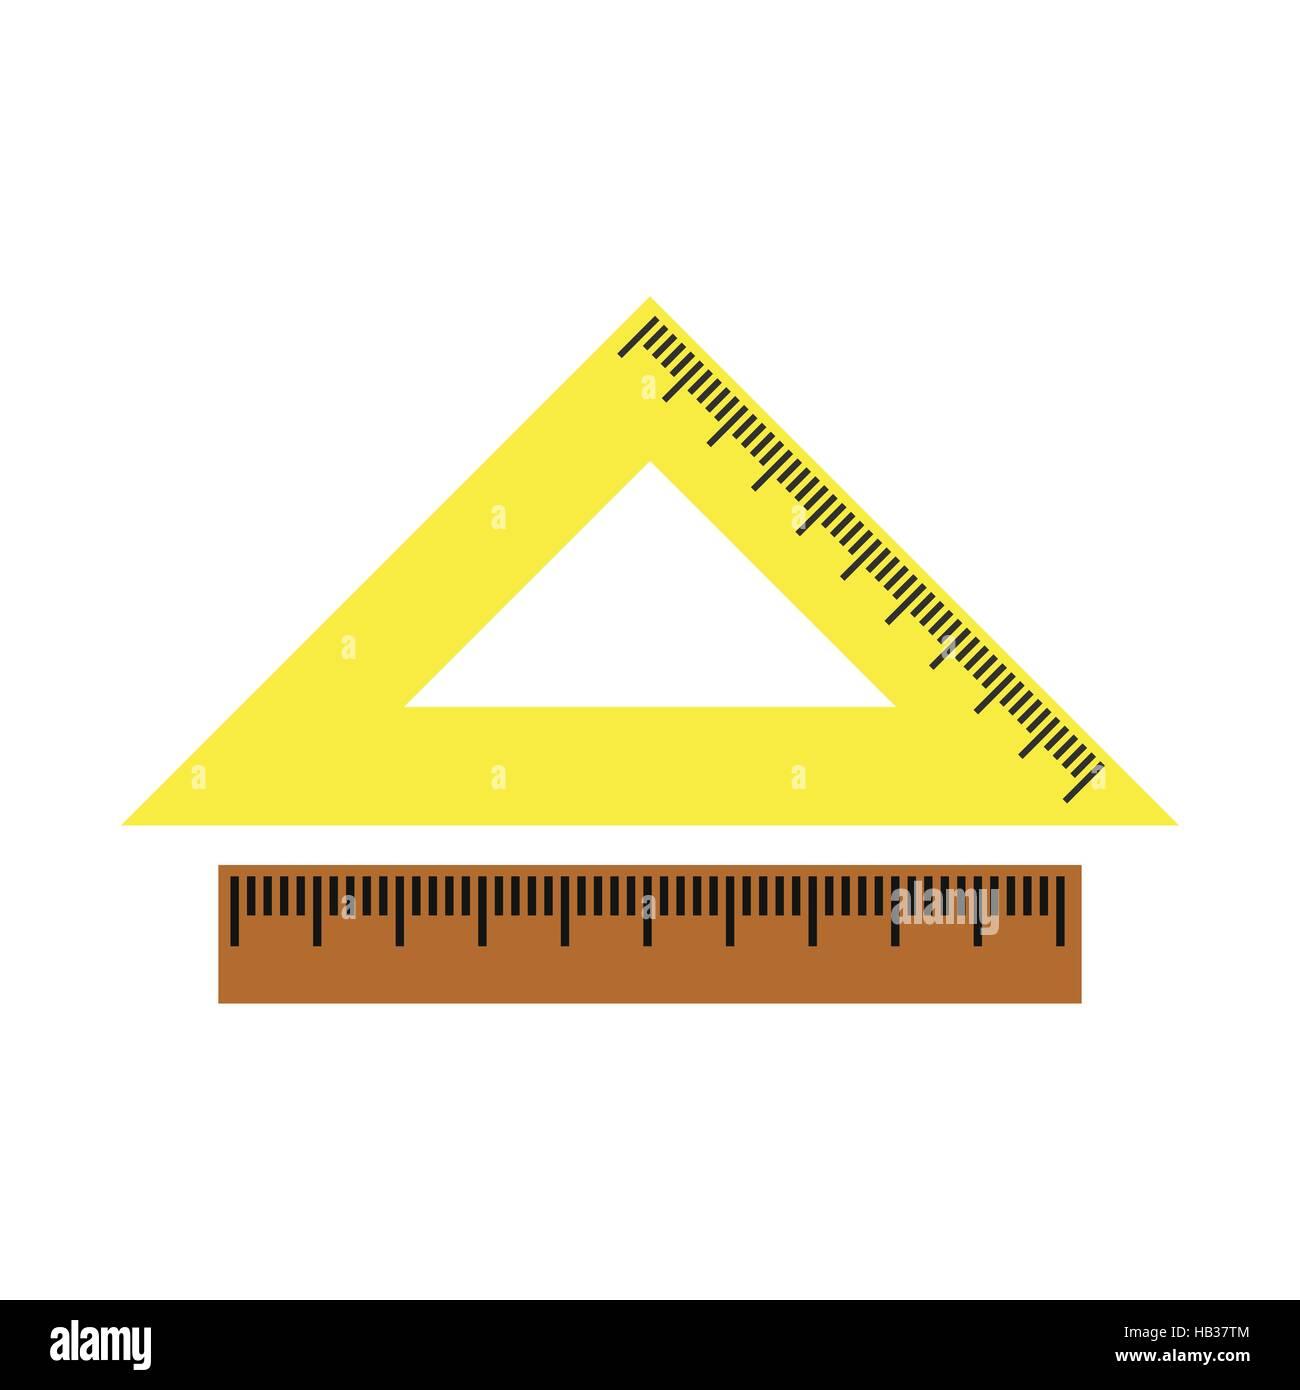 2 school rulers flat icon - Stock Vector